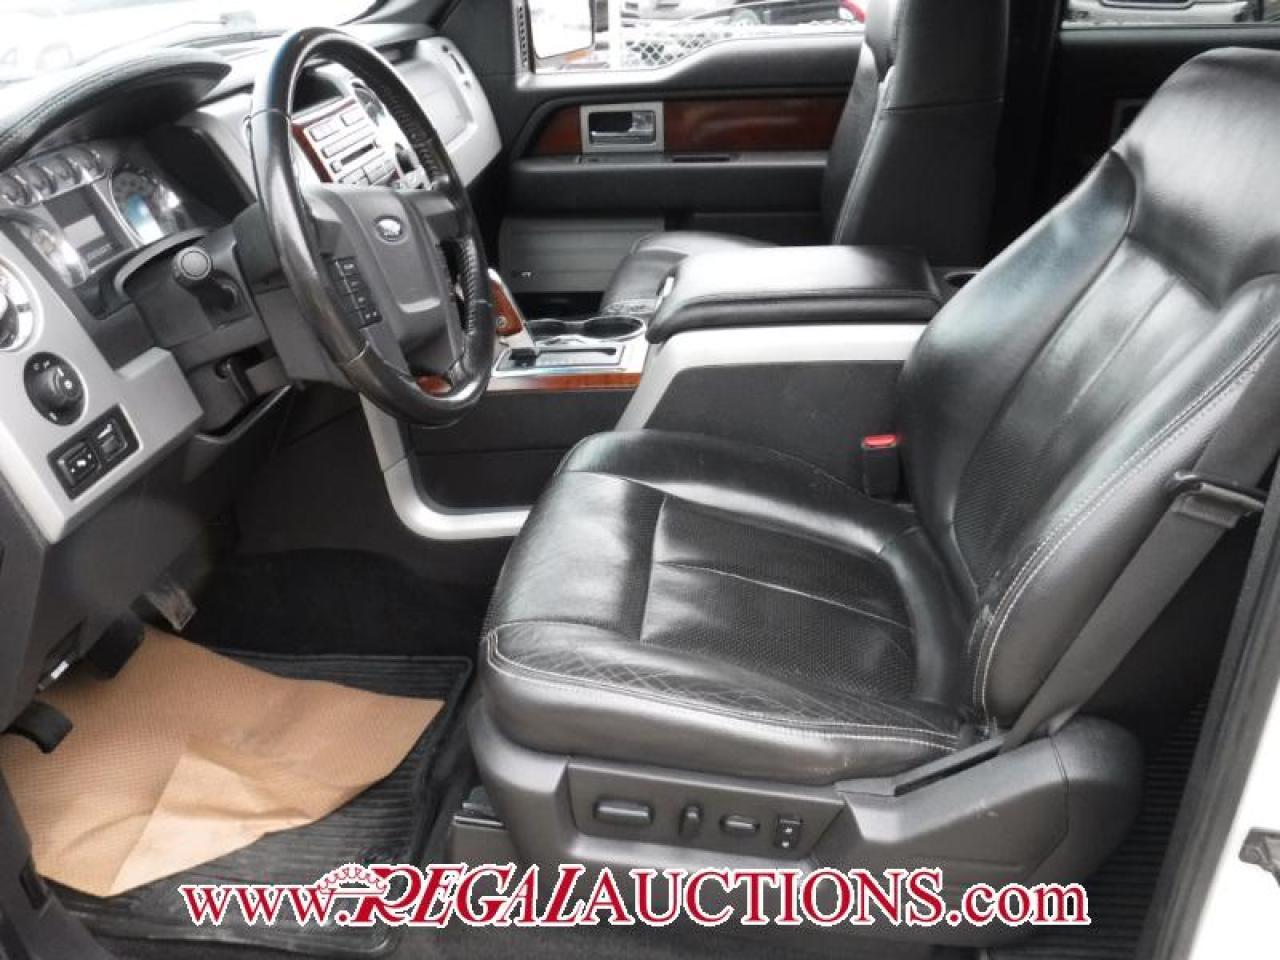 2009 Ford F-150 LARIAT SuperCrew 4WD